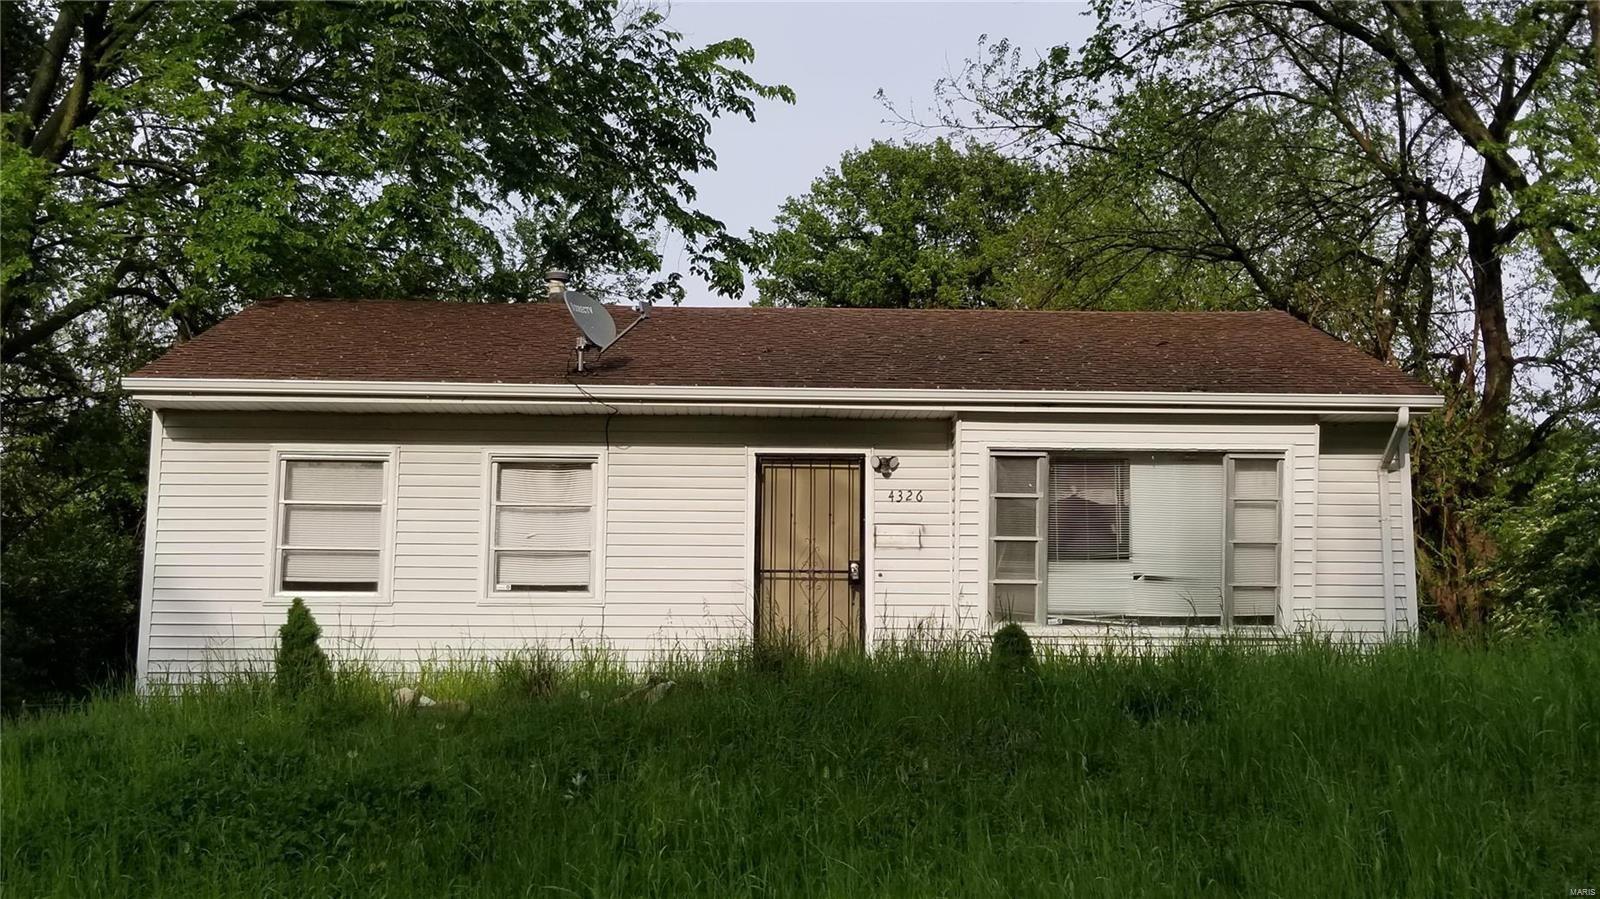 4326 Russet Drive, Bel Ridge, MO 63134 - MLS#: 20029119